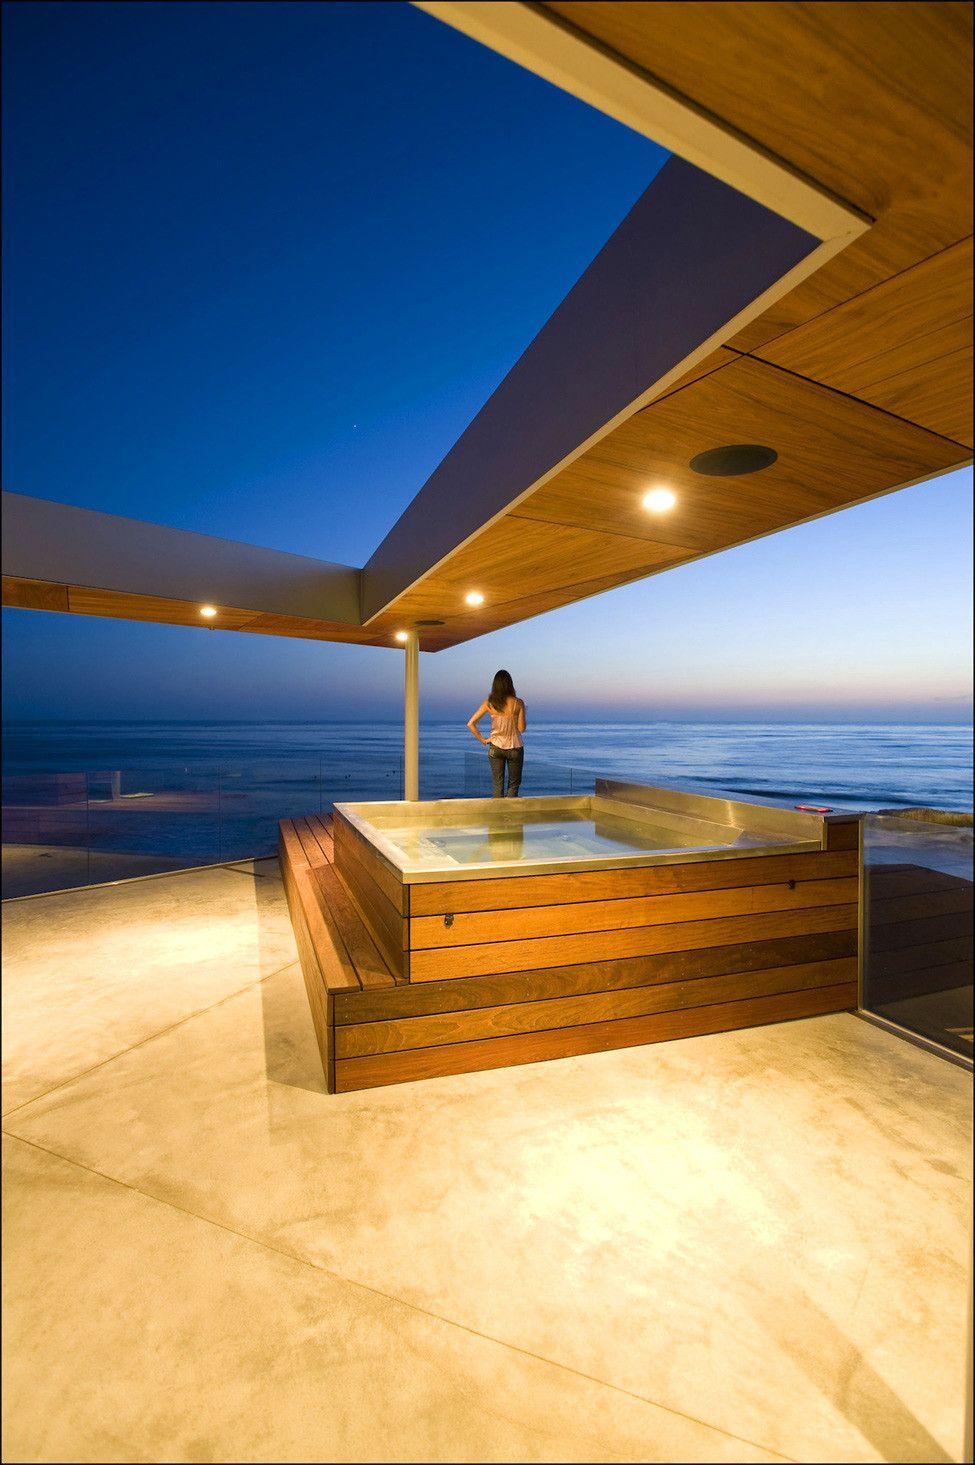 Lemperle Residence rooftop terrace by Jonathan Segal